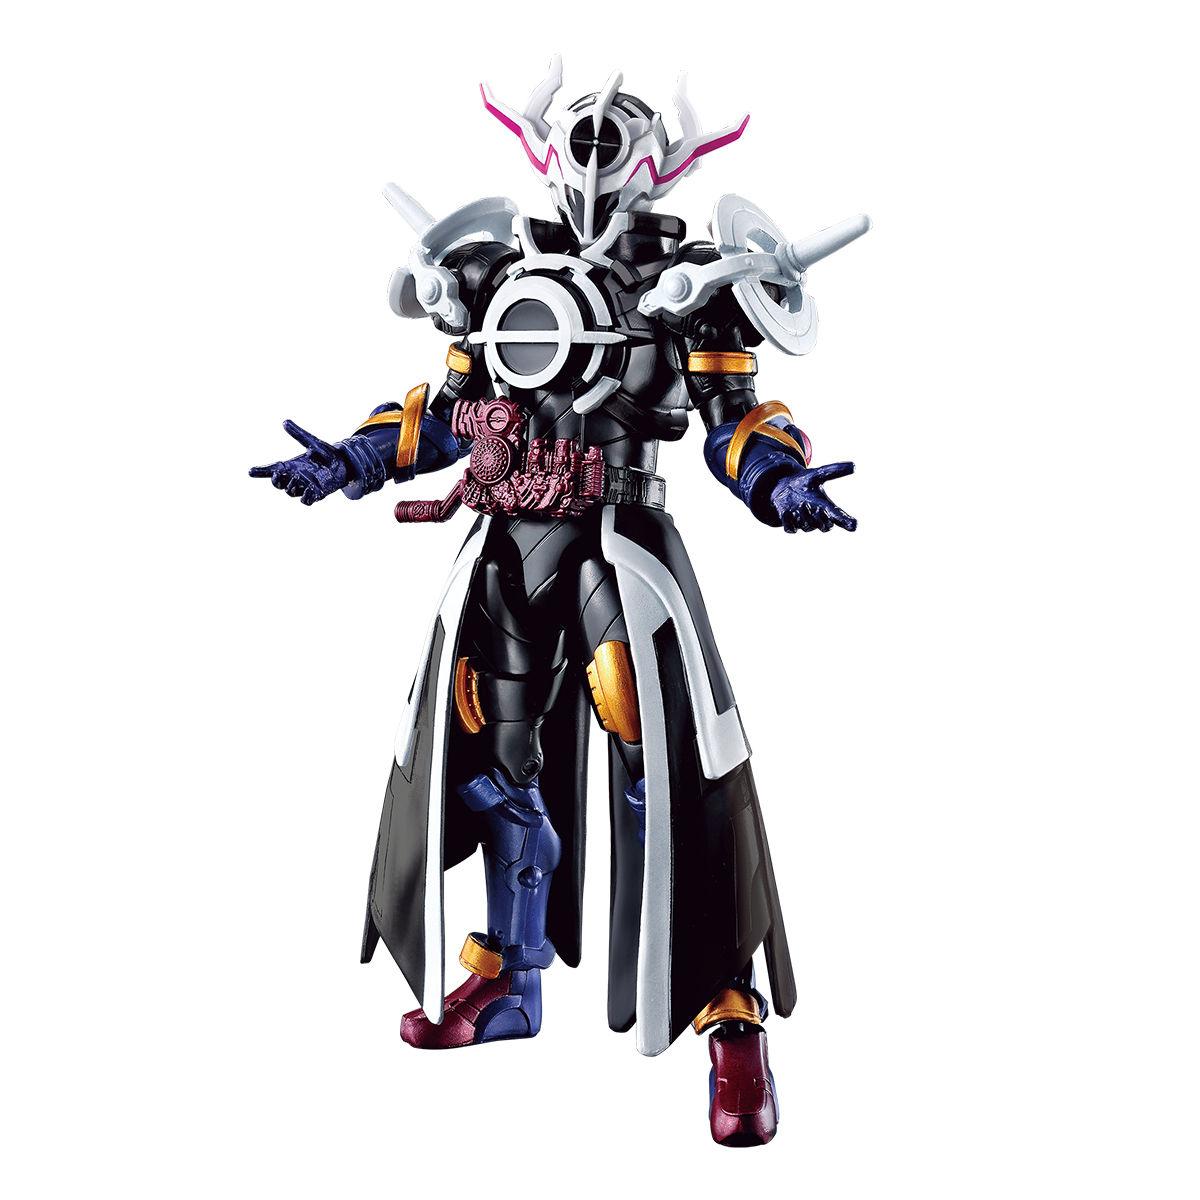 RKF RIDER KICK'S FIGURE 仮面ライダーエボル ブラックホールフォーム